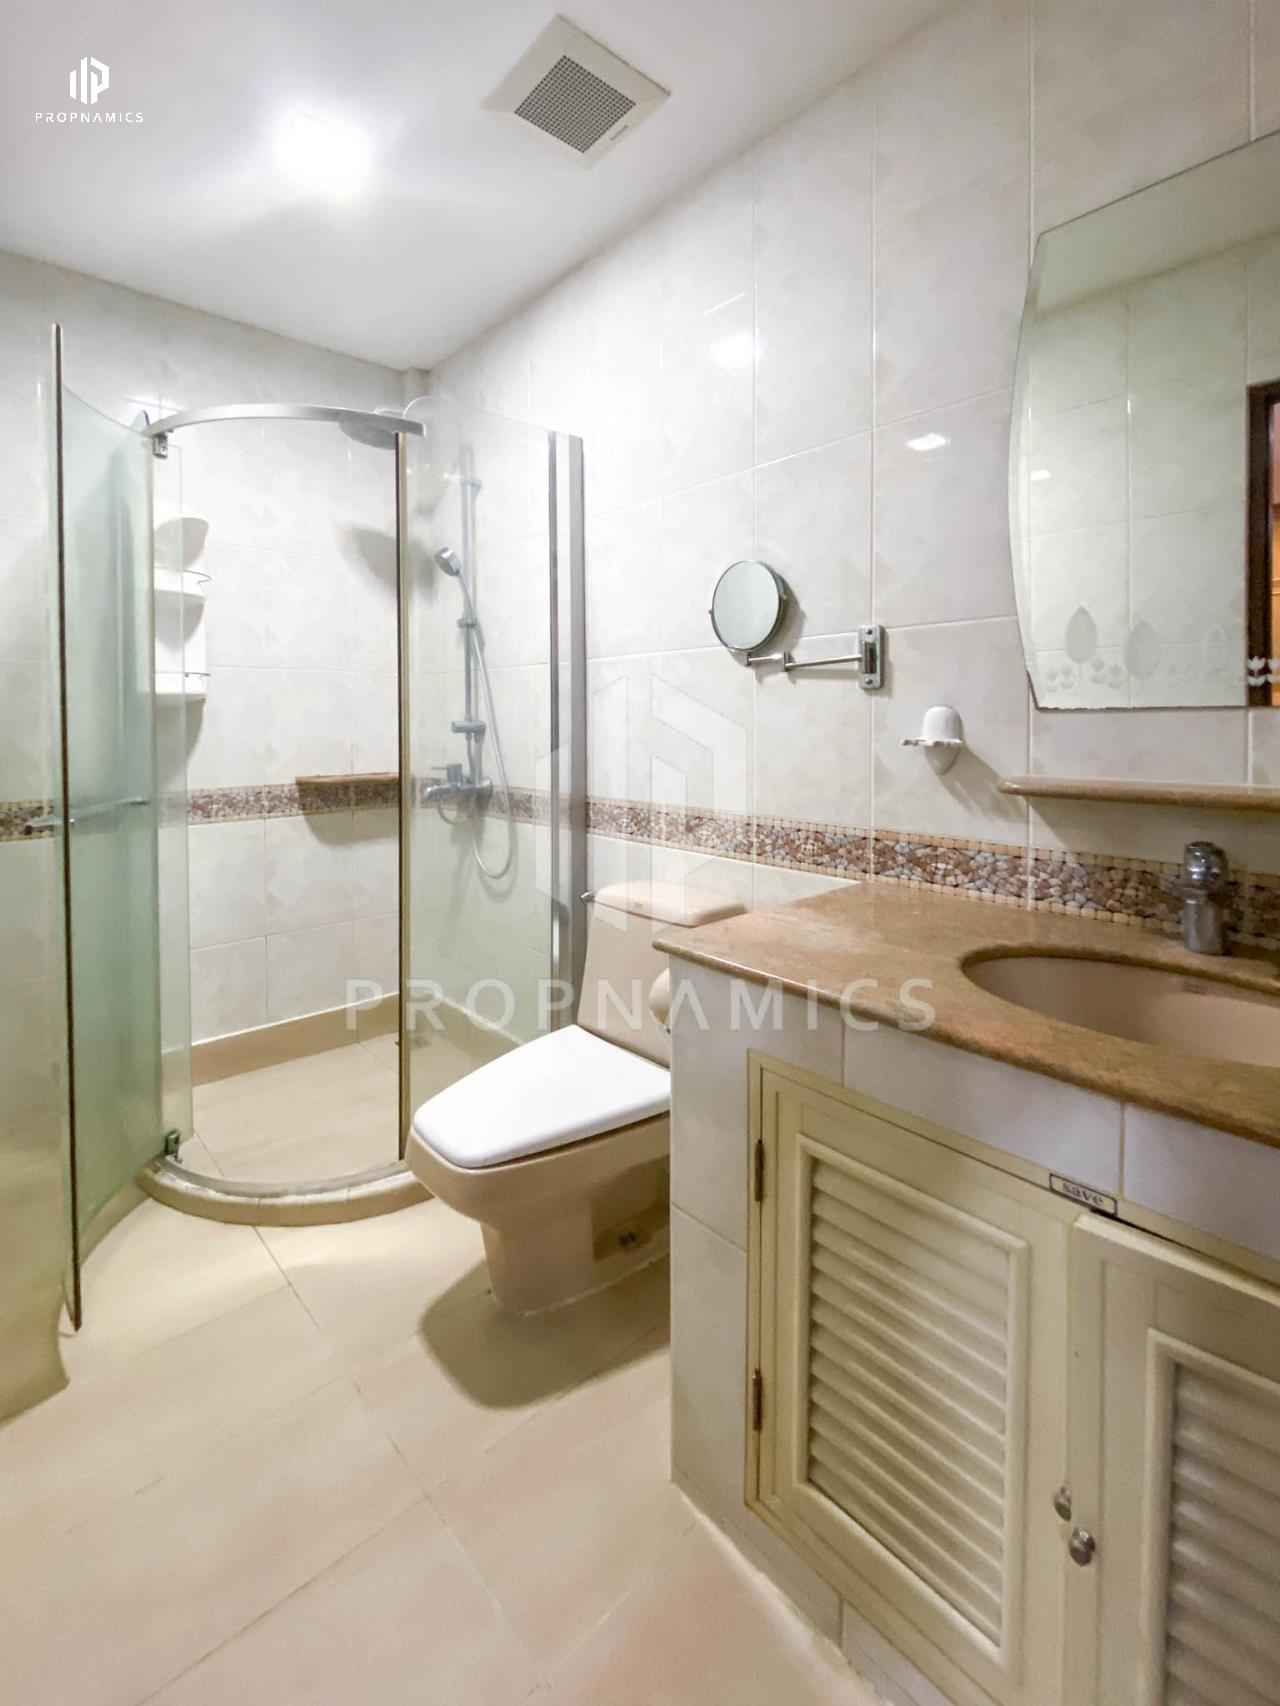 Propnamics Co., Ltd Agency's FOR RENT: SINGLE HOUSE IN SUKHUMVIT 26 20